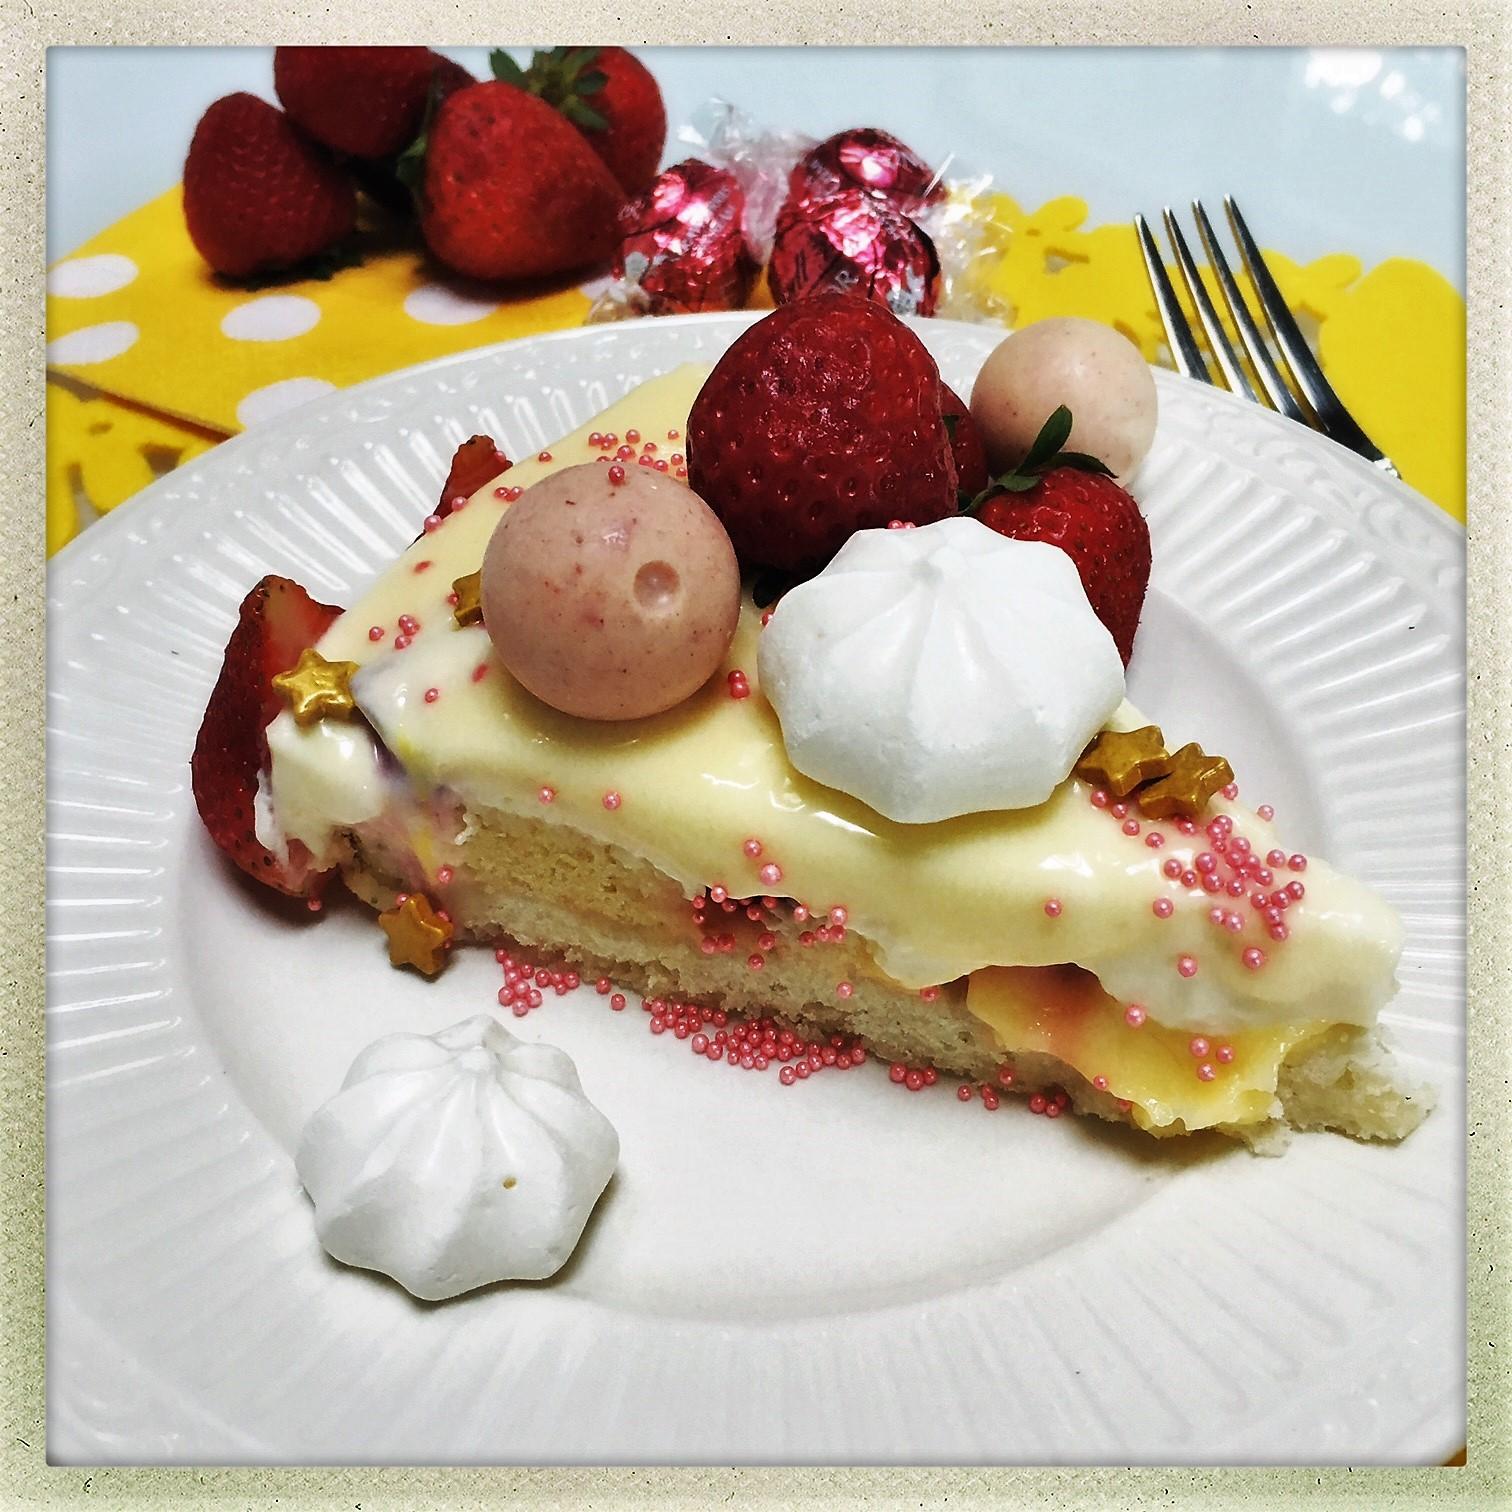 stawberry shortcake cheesecake 14.jpg